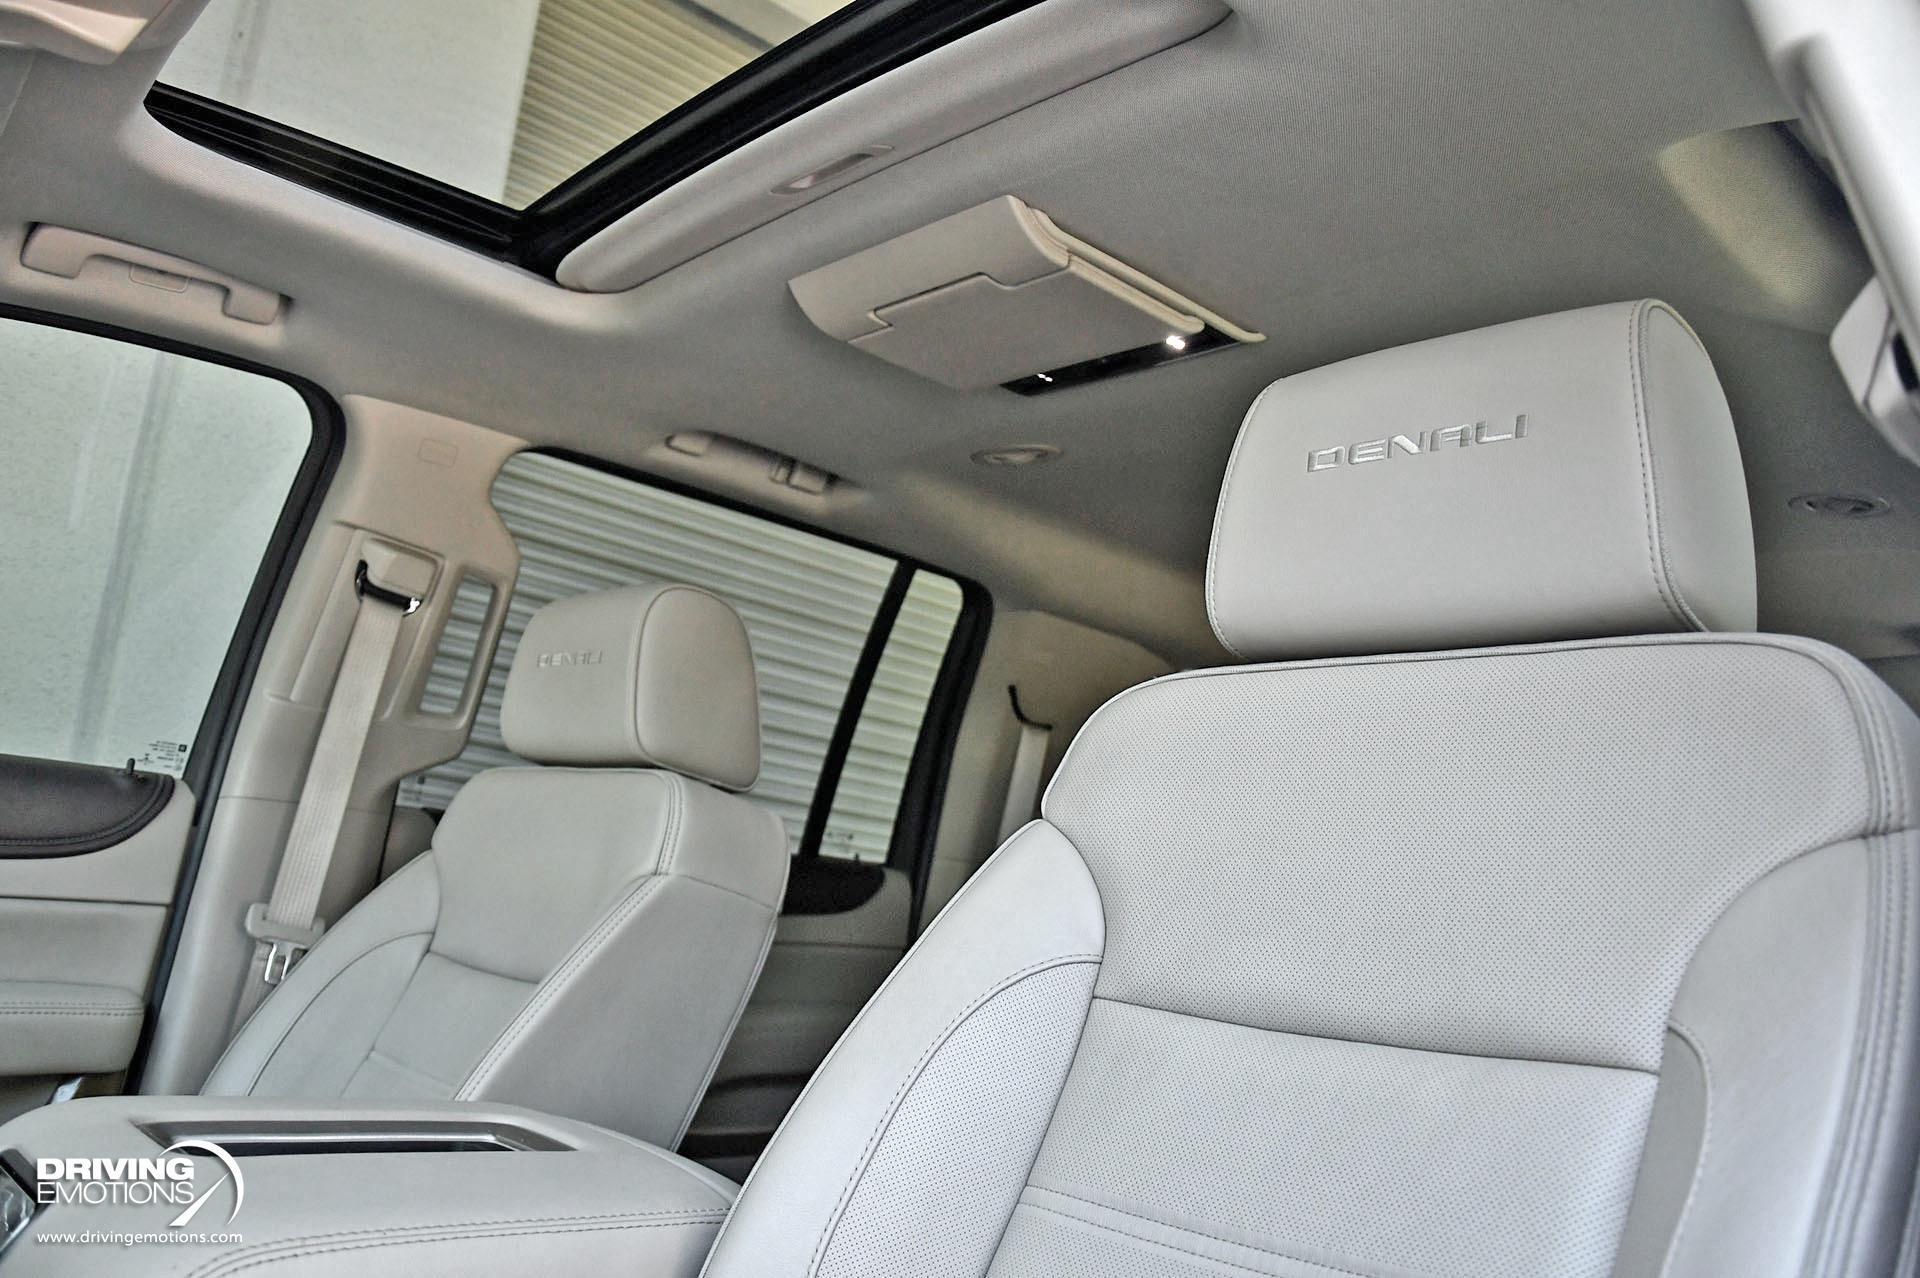 Used 2017 GMC Yukon XL Denali 4WD Denali $82K MSRP!! | Lake Park, FL